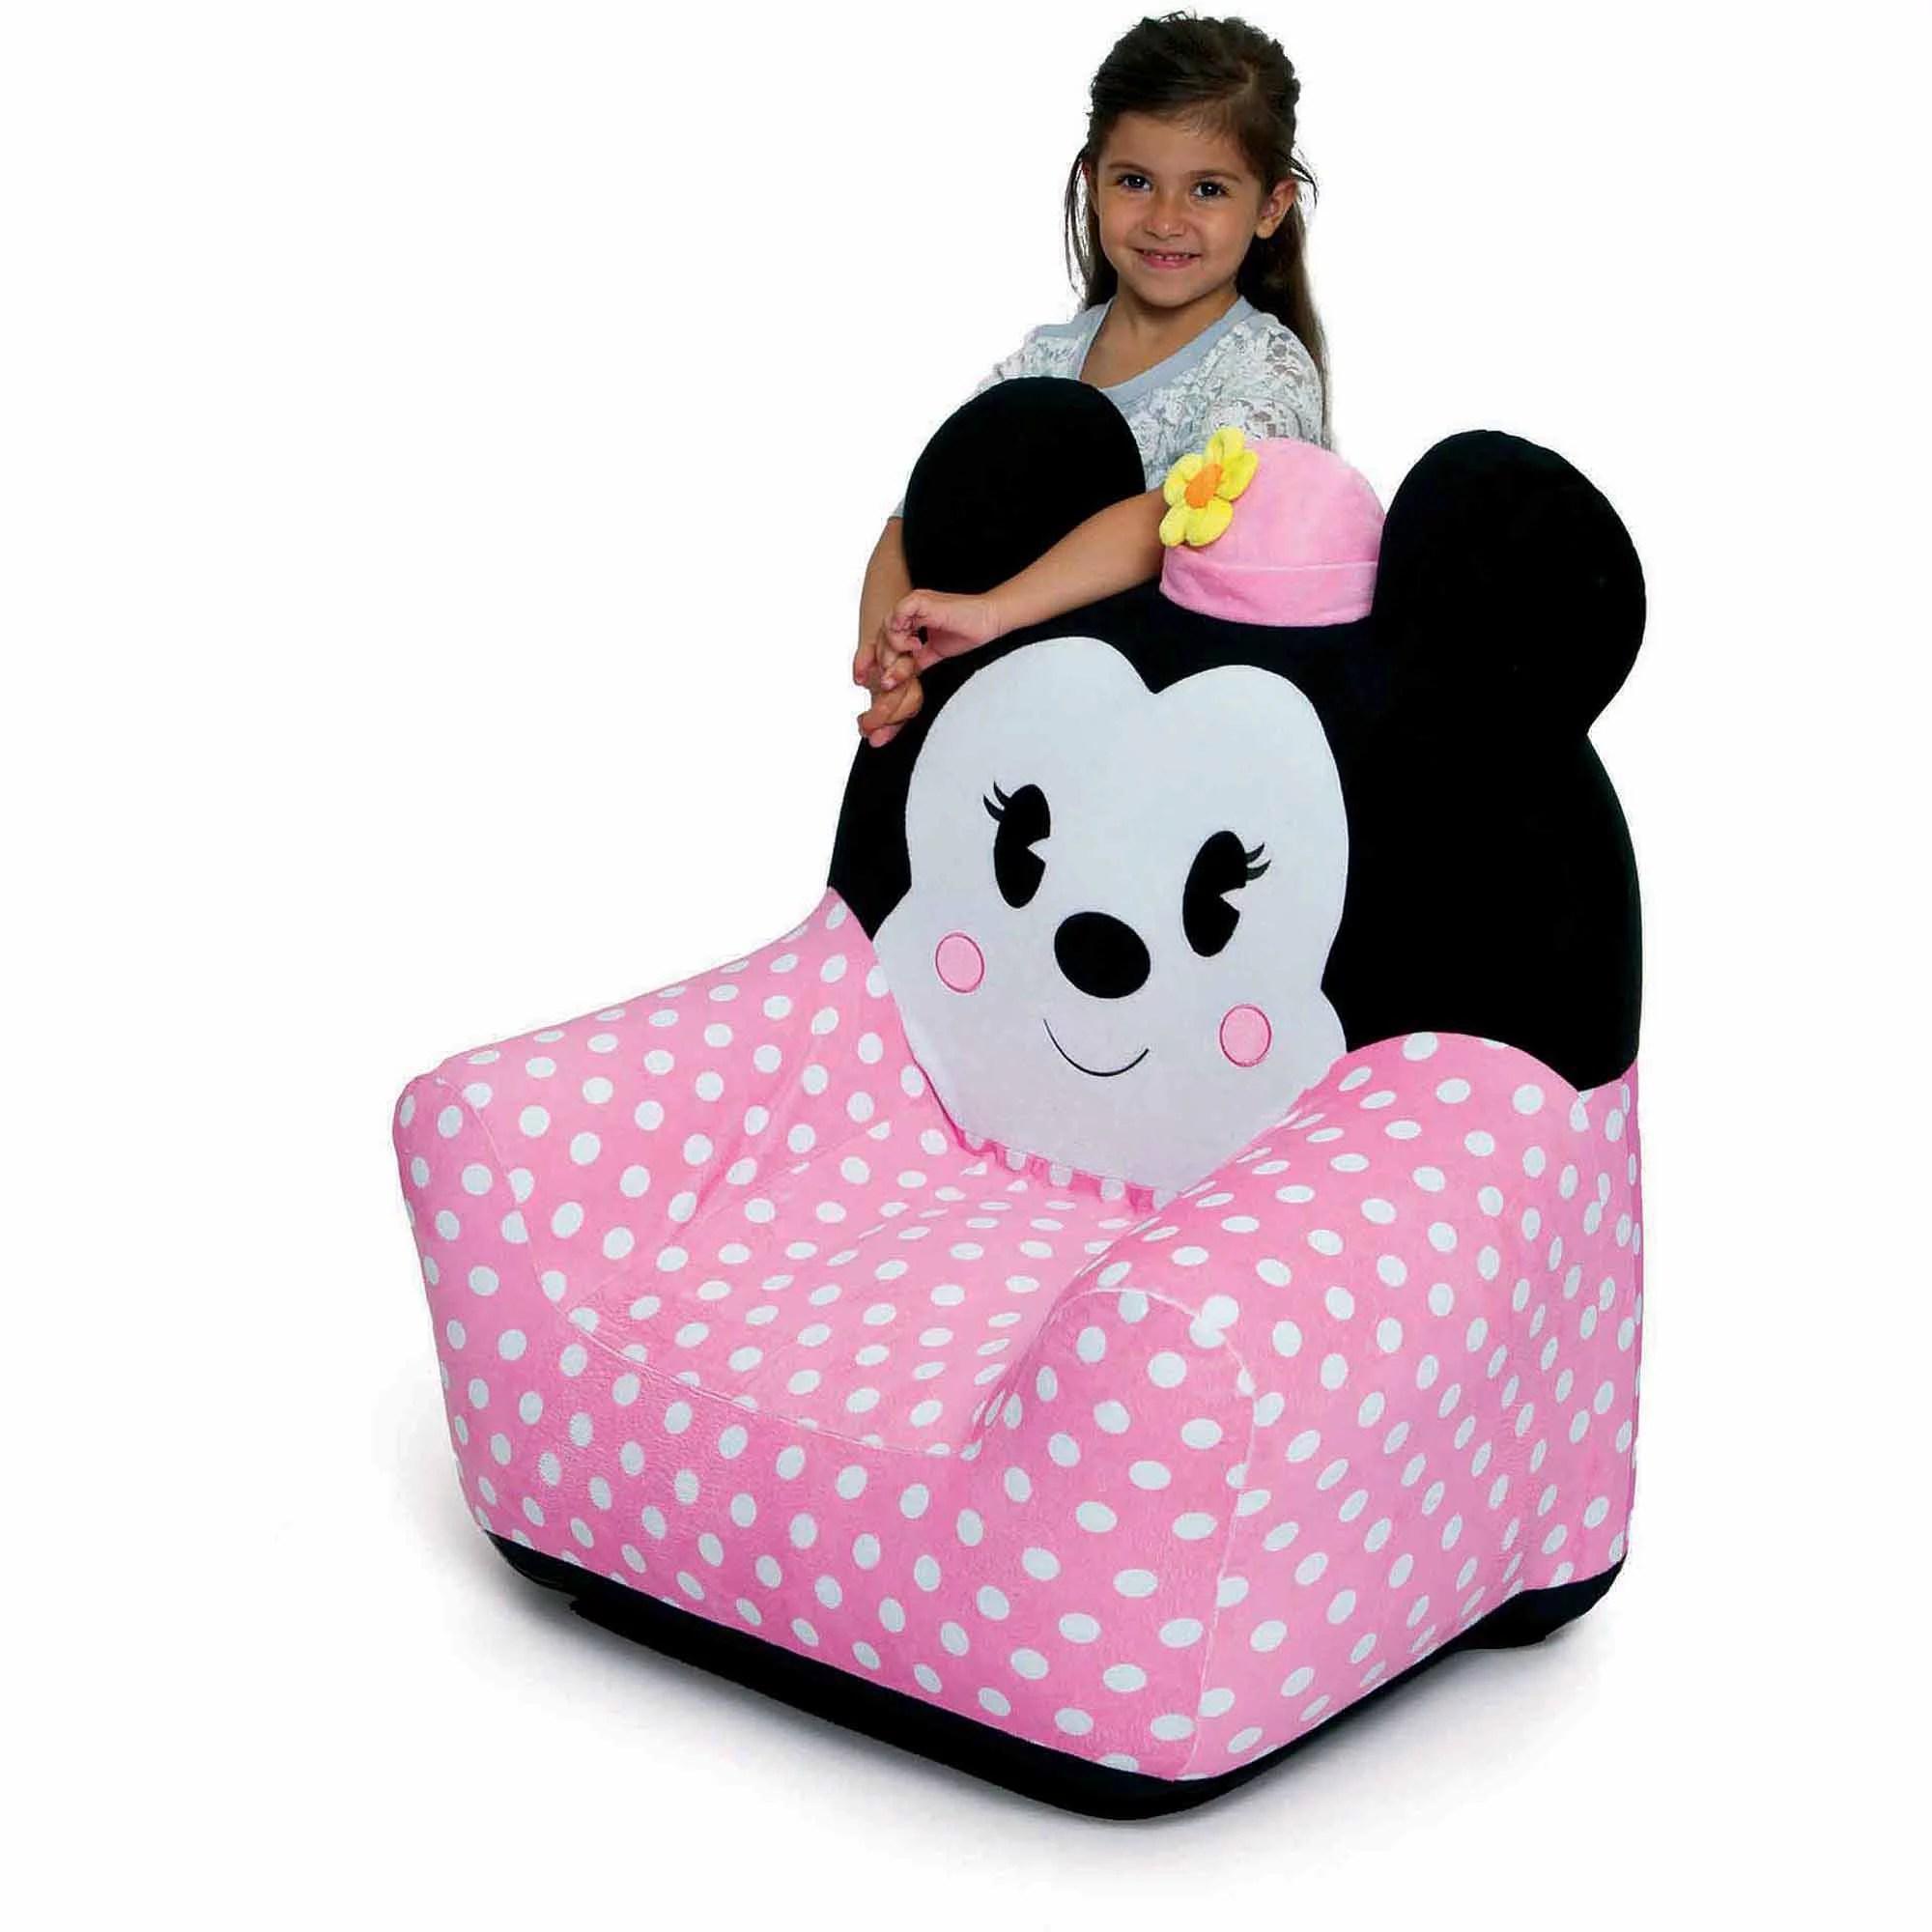 minnie mouse chair walmart frank gehry cardboard chairs disney club com